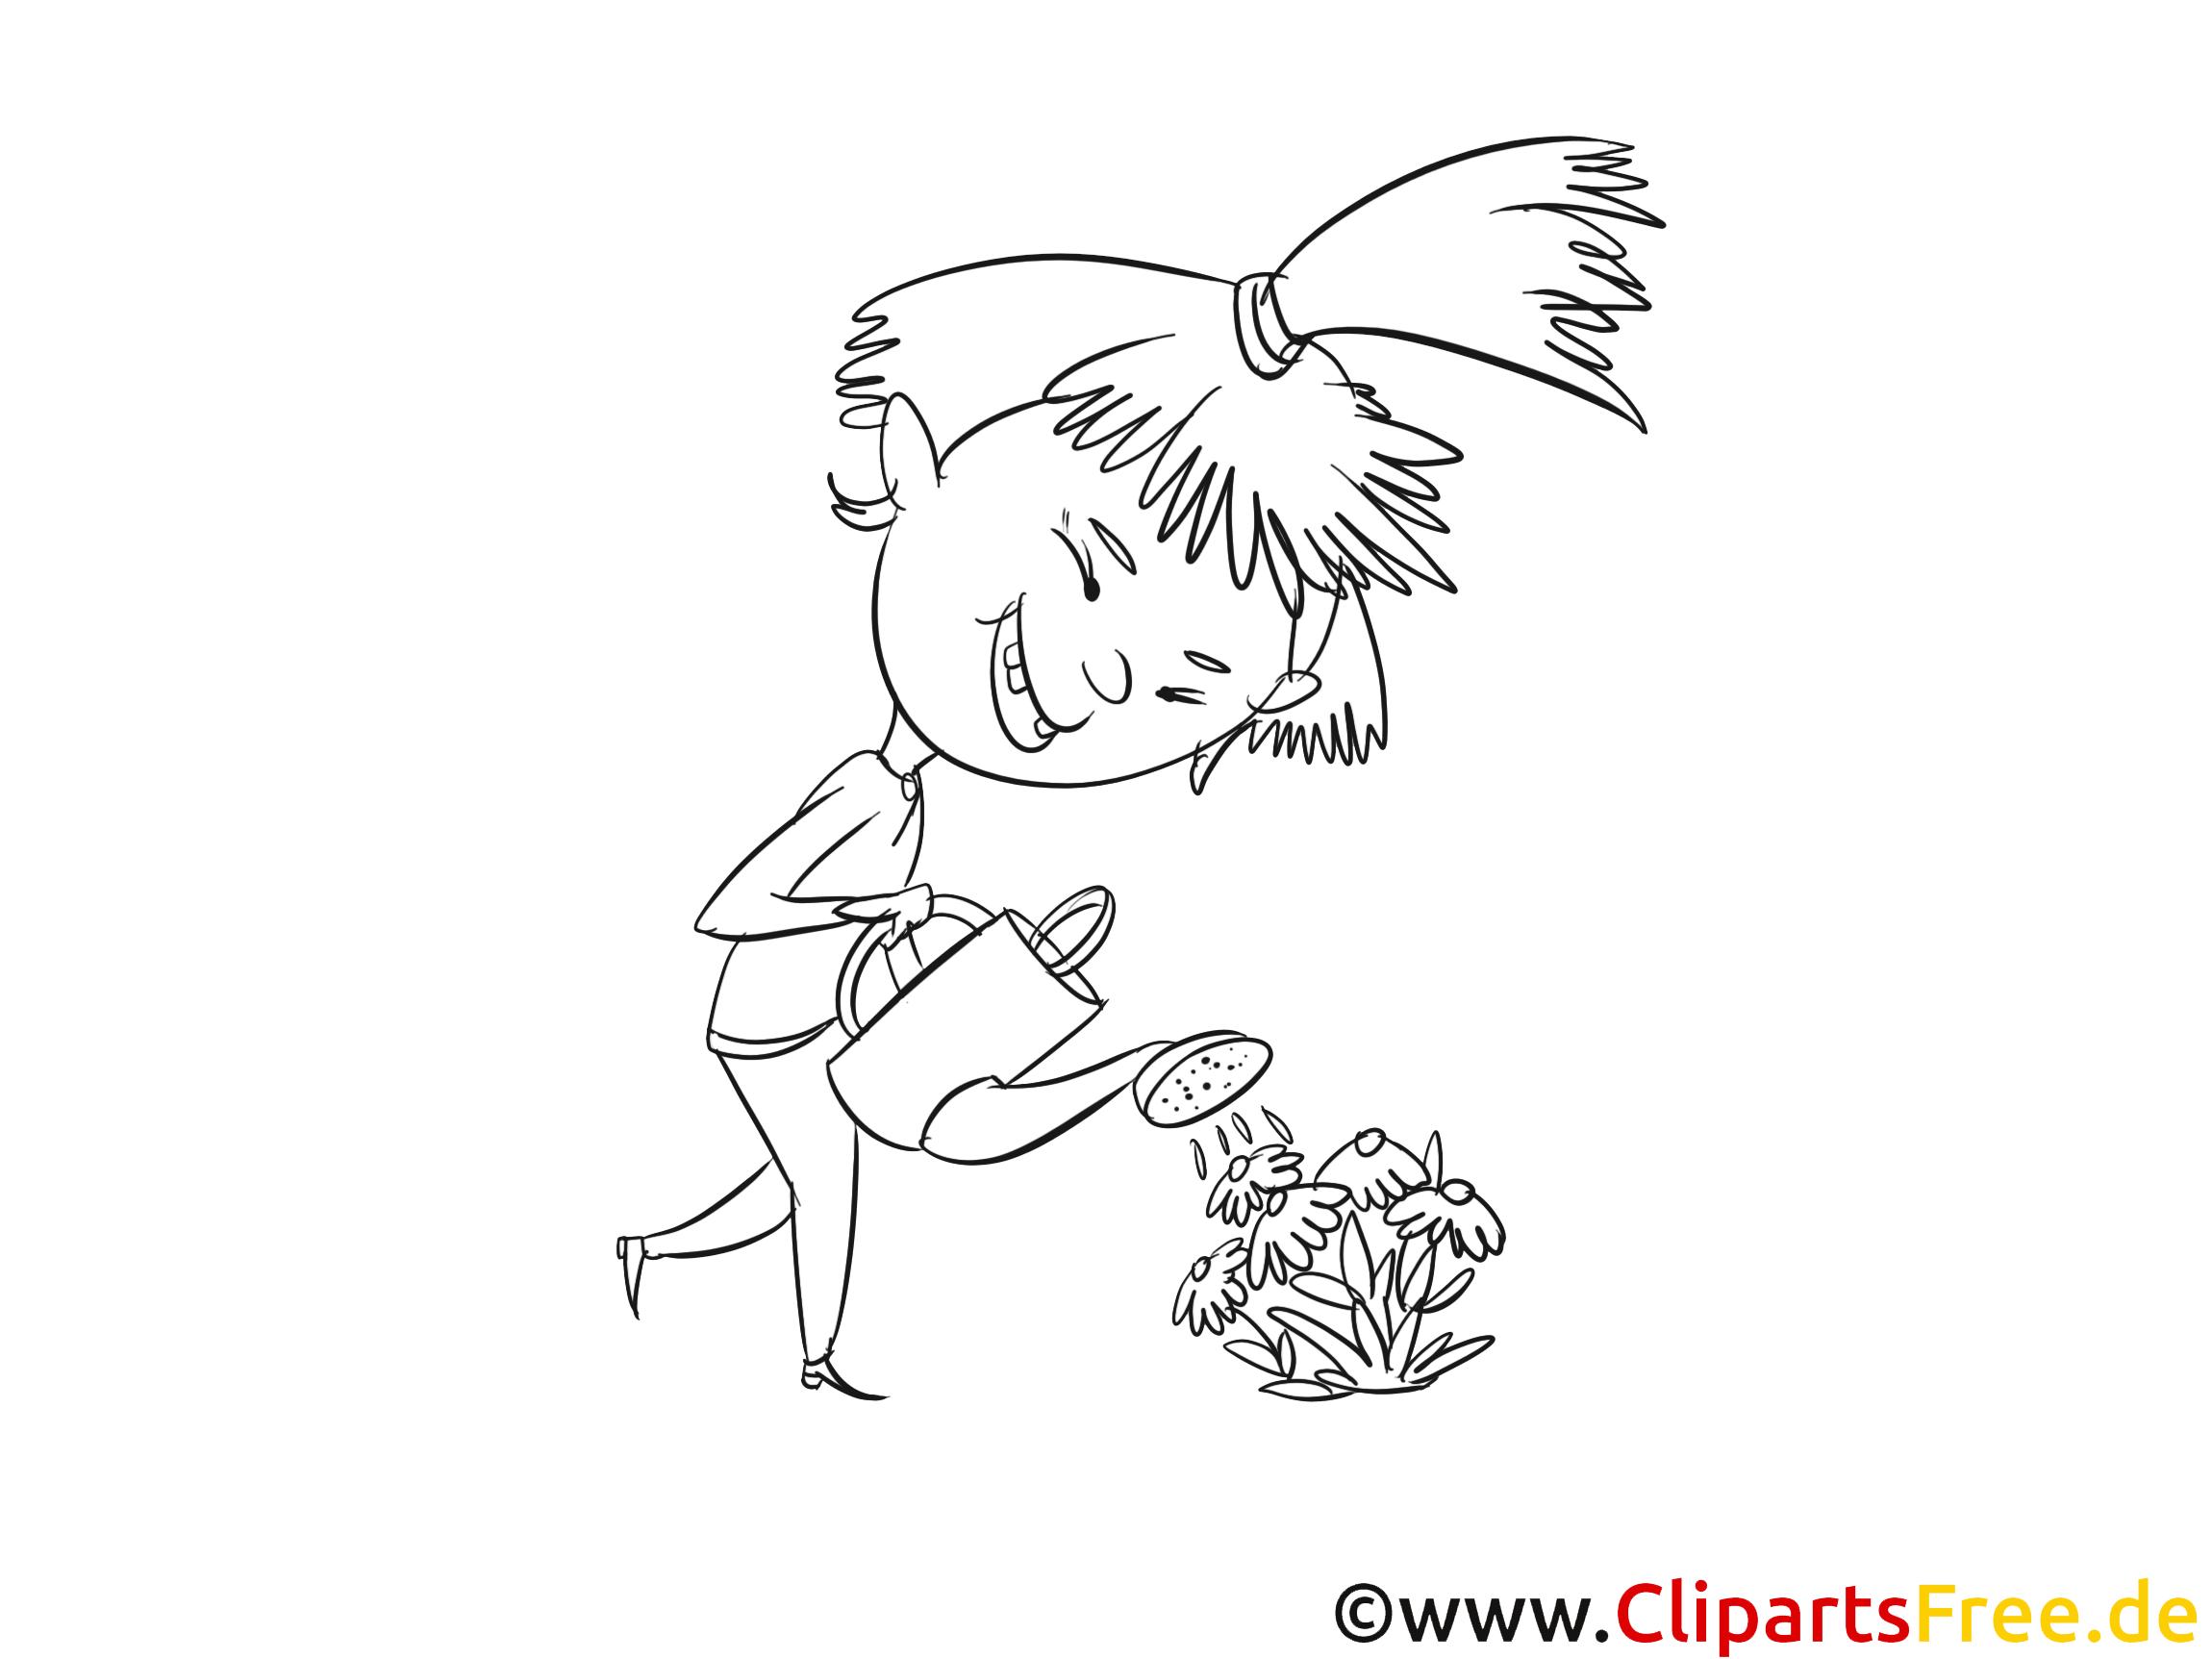 Fleurs image – Coloriage fille illustration